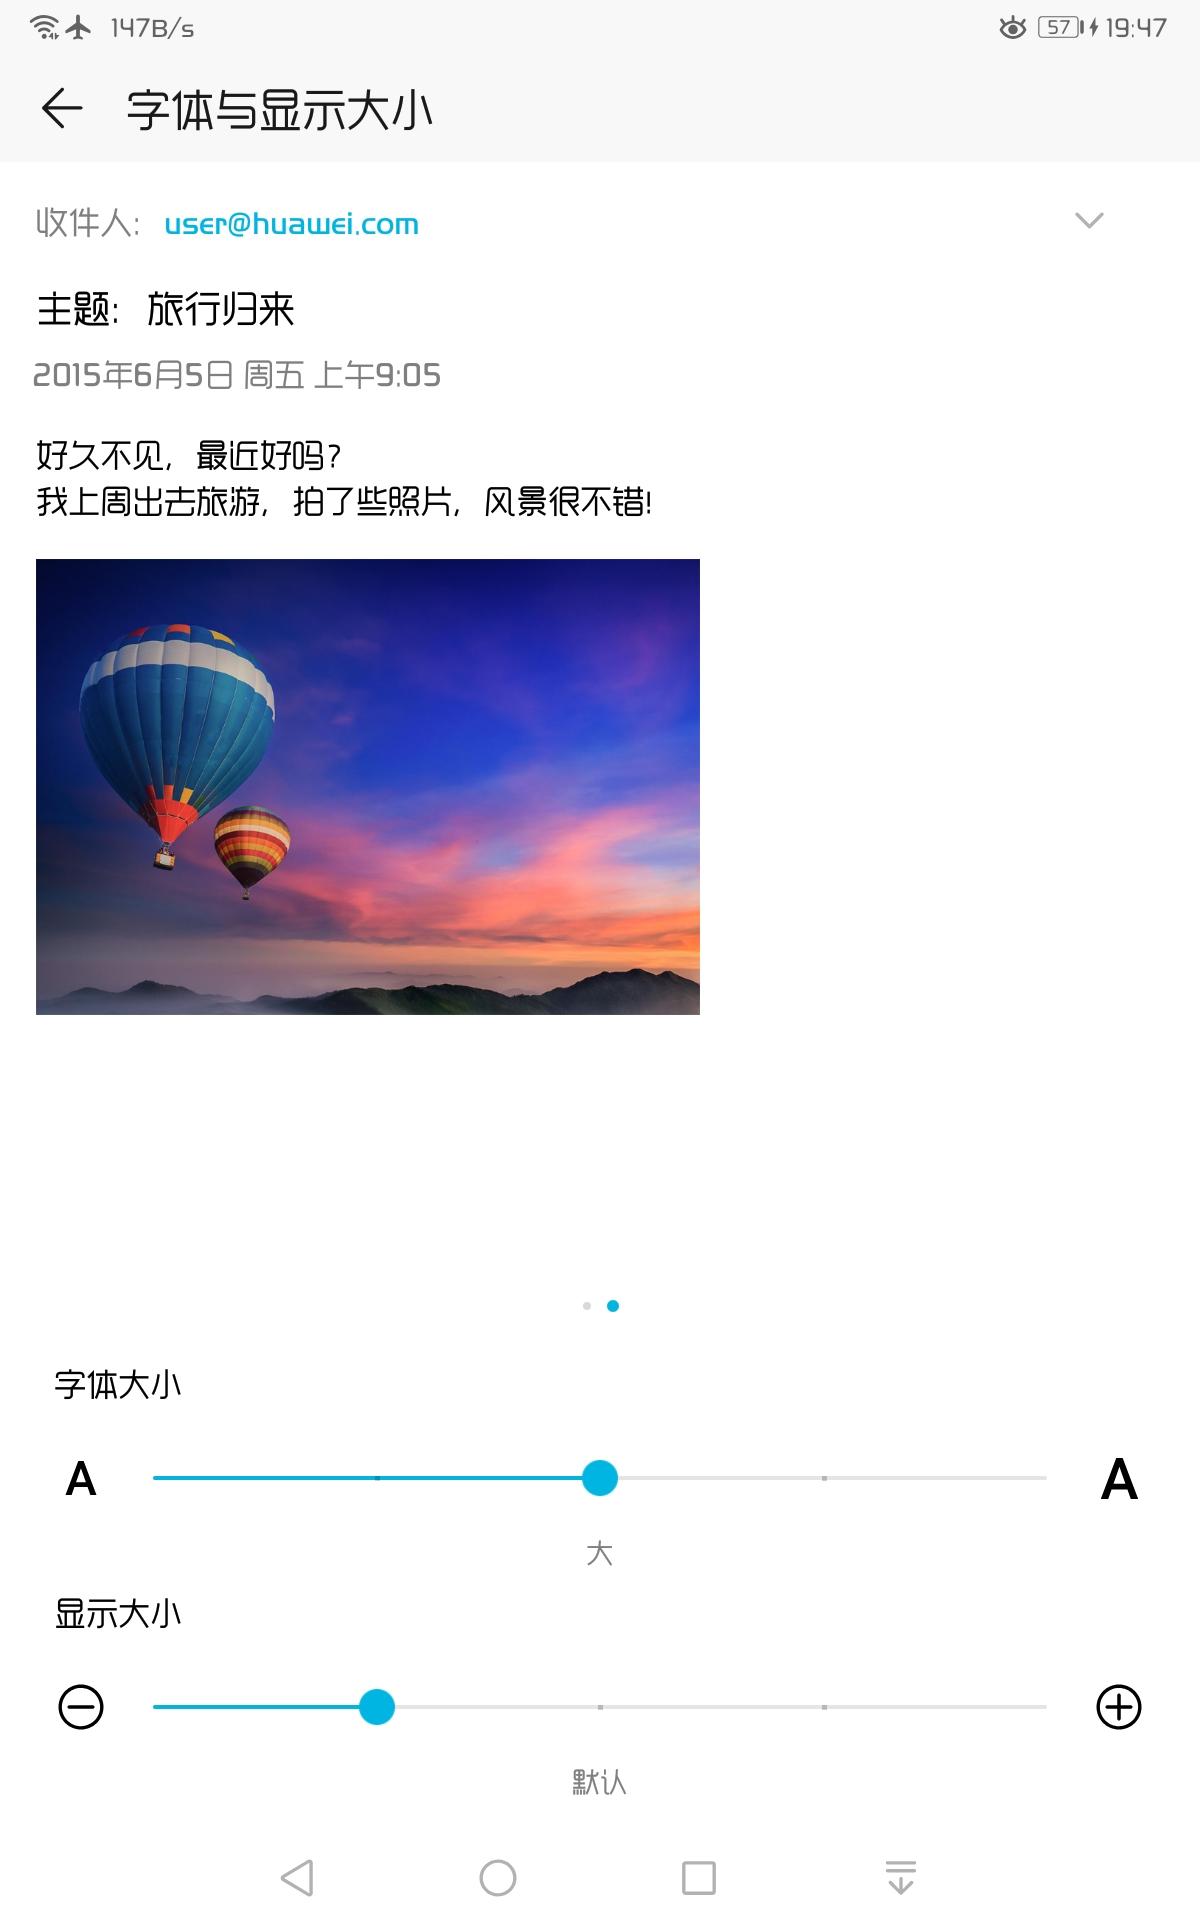 Screenshot_20190326_194720_com.android.settings.jpg